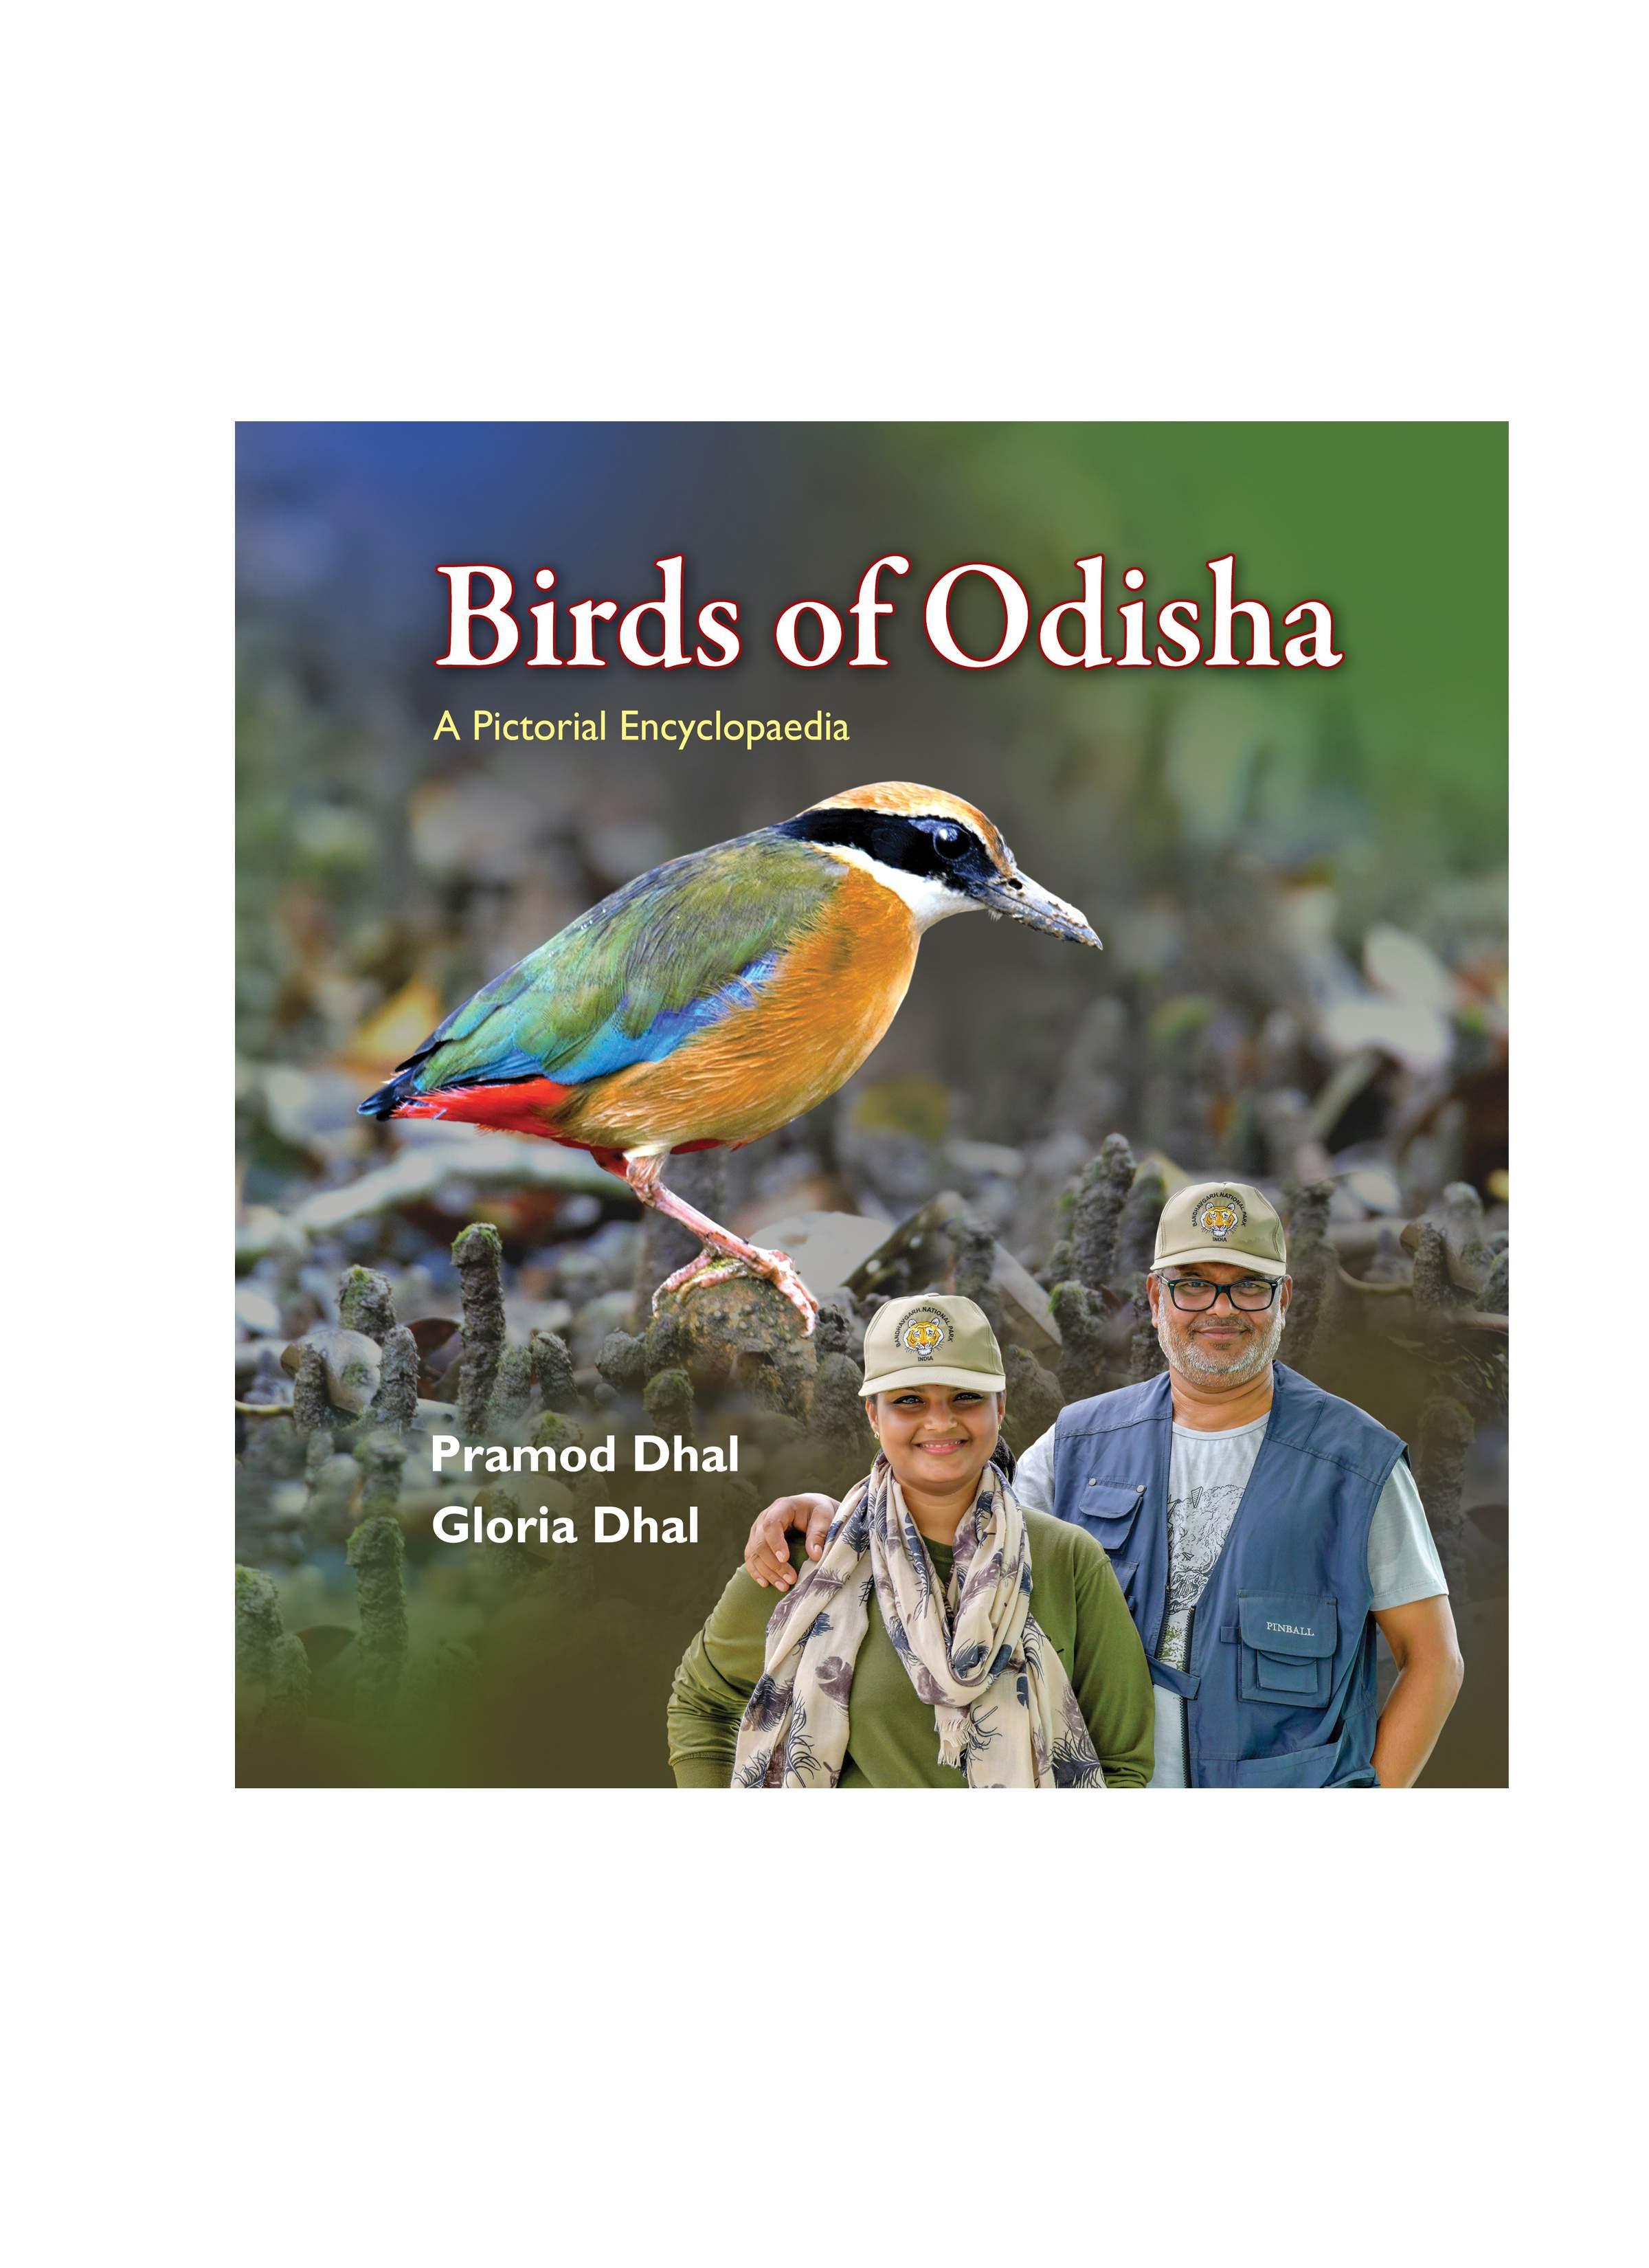 BirdsofOdisha book